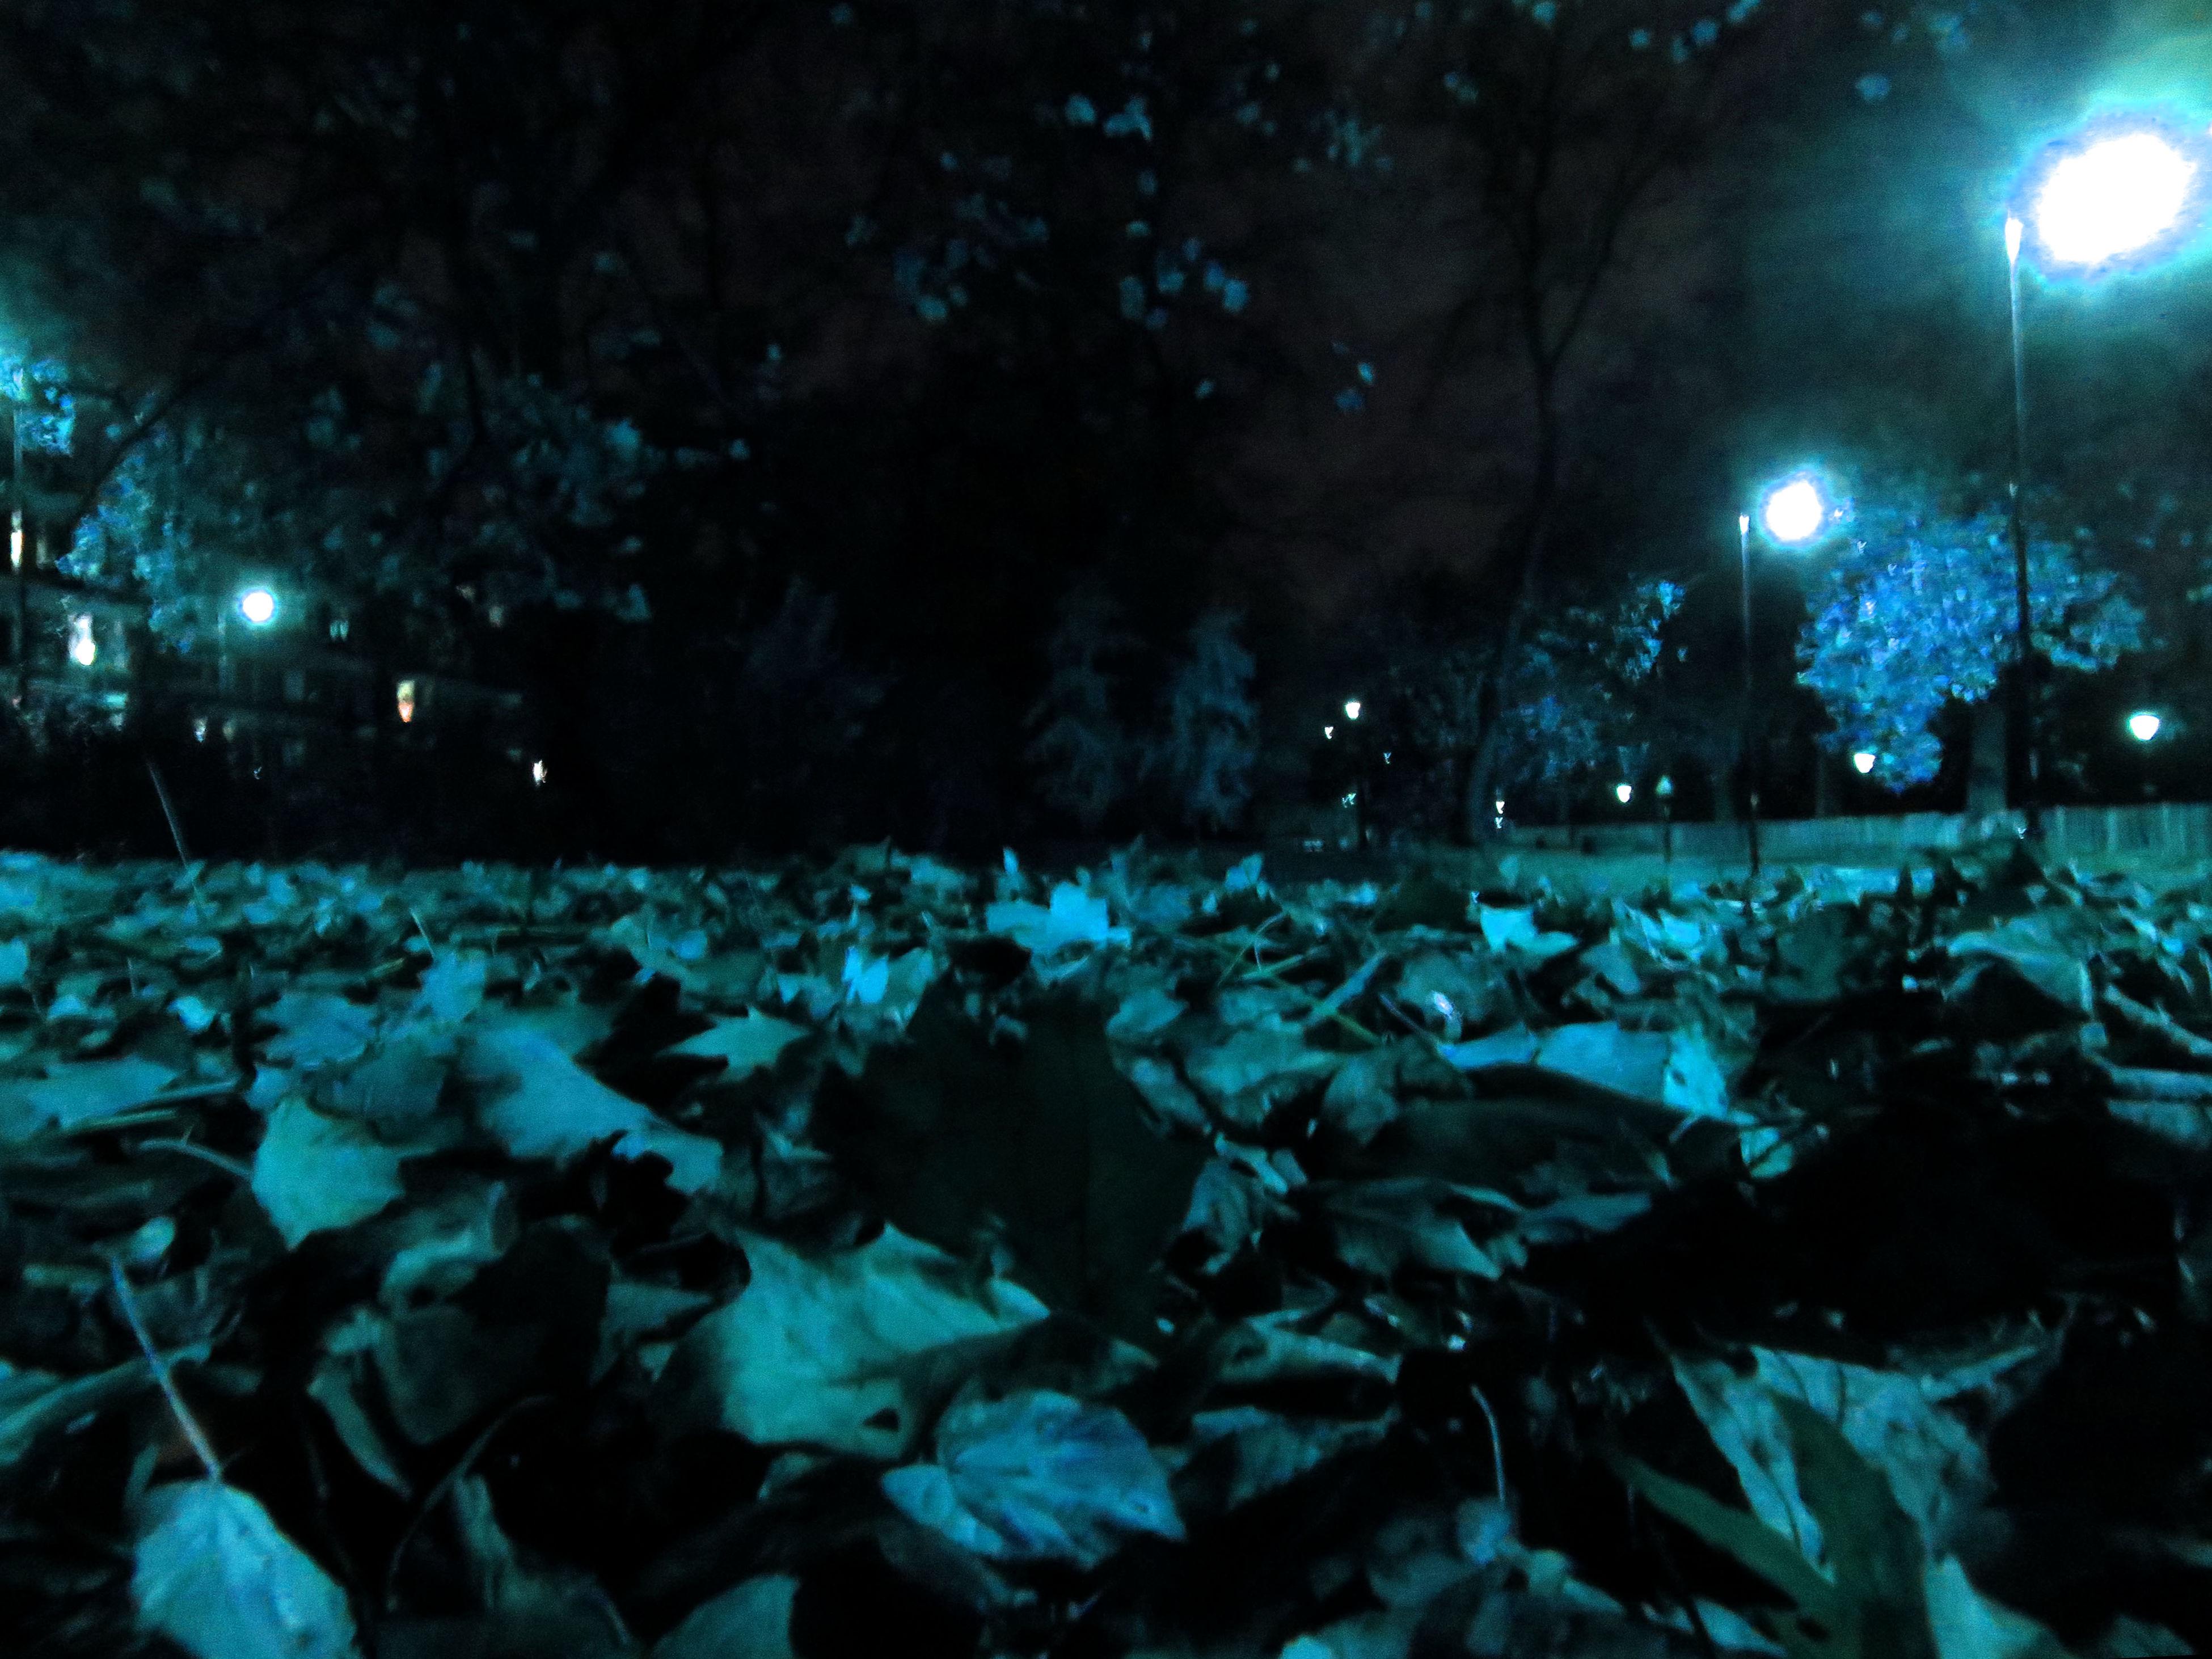 night, illuminated, lighting equipment, winter, cold temperature, light - natural phenomenon, snow, street light, season, outdoors, nature, park - man made space, dark, water, no people, glowing, field, abundance, weather, celebration